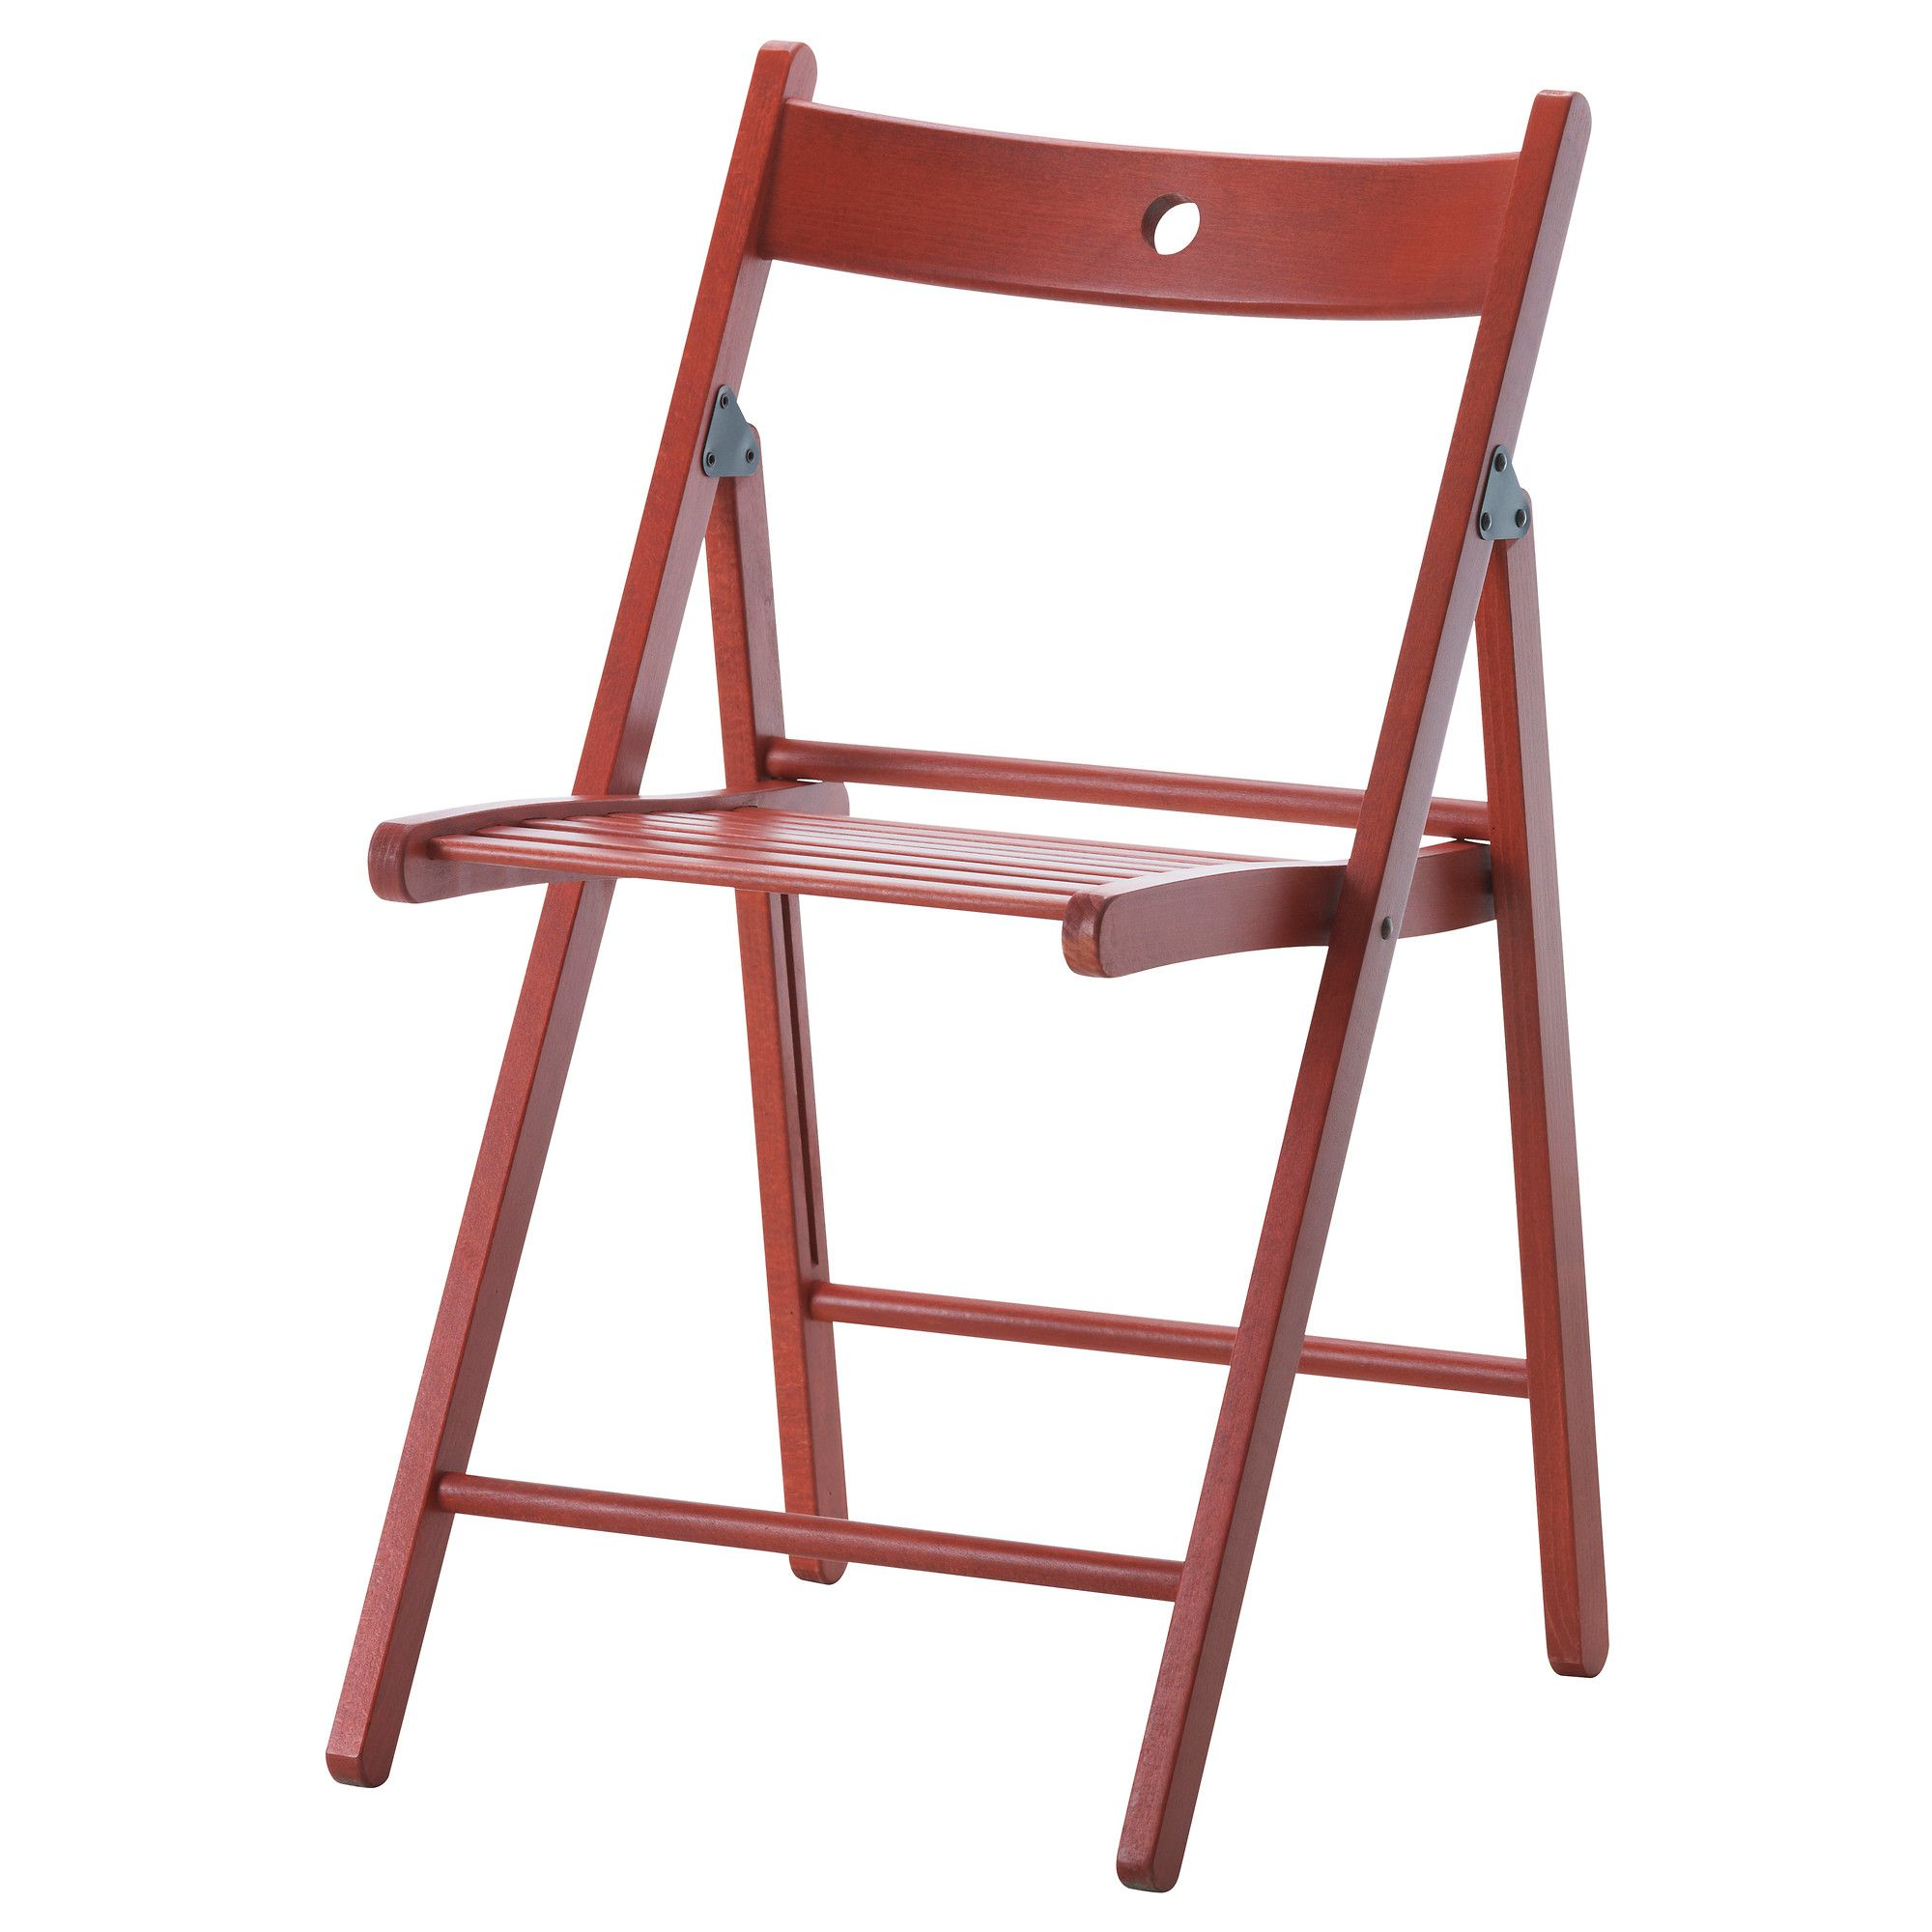 Ikea Terje Folding Chair Red Ikea Folding Chairs Folding